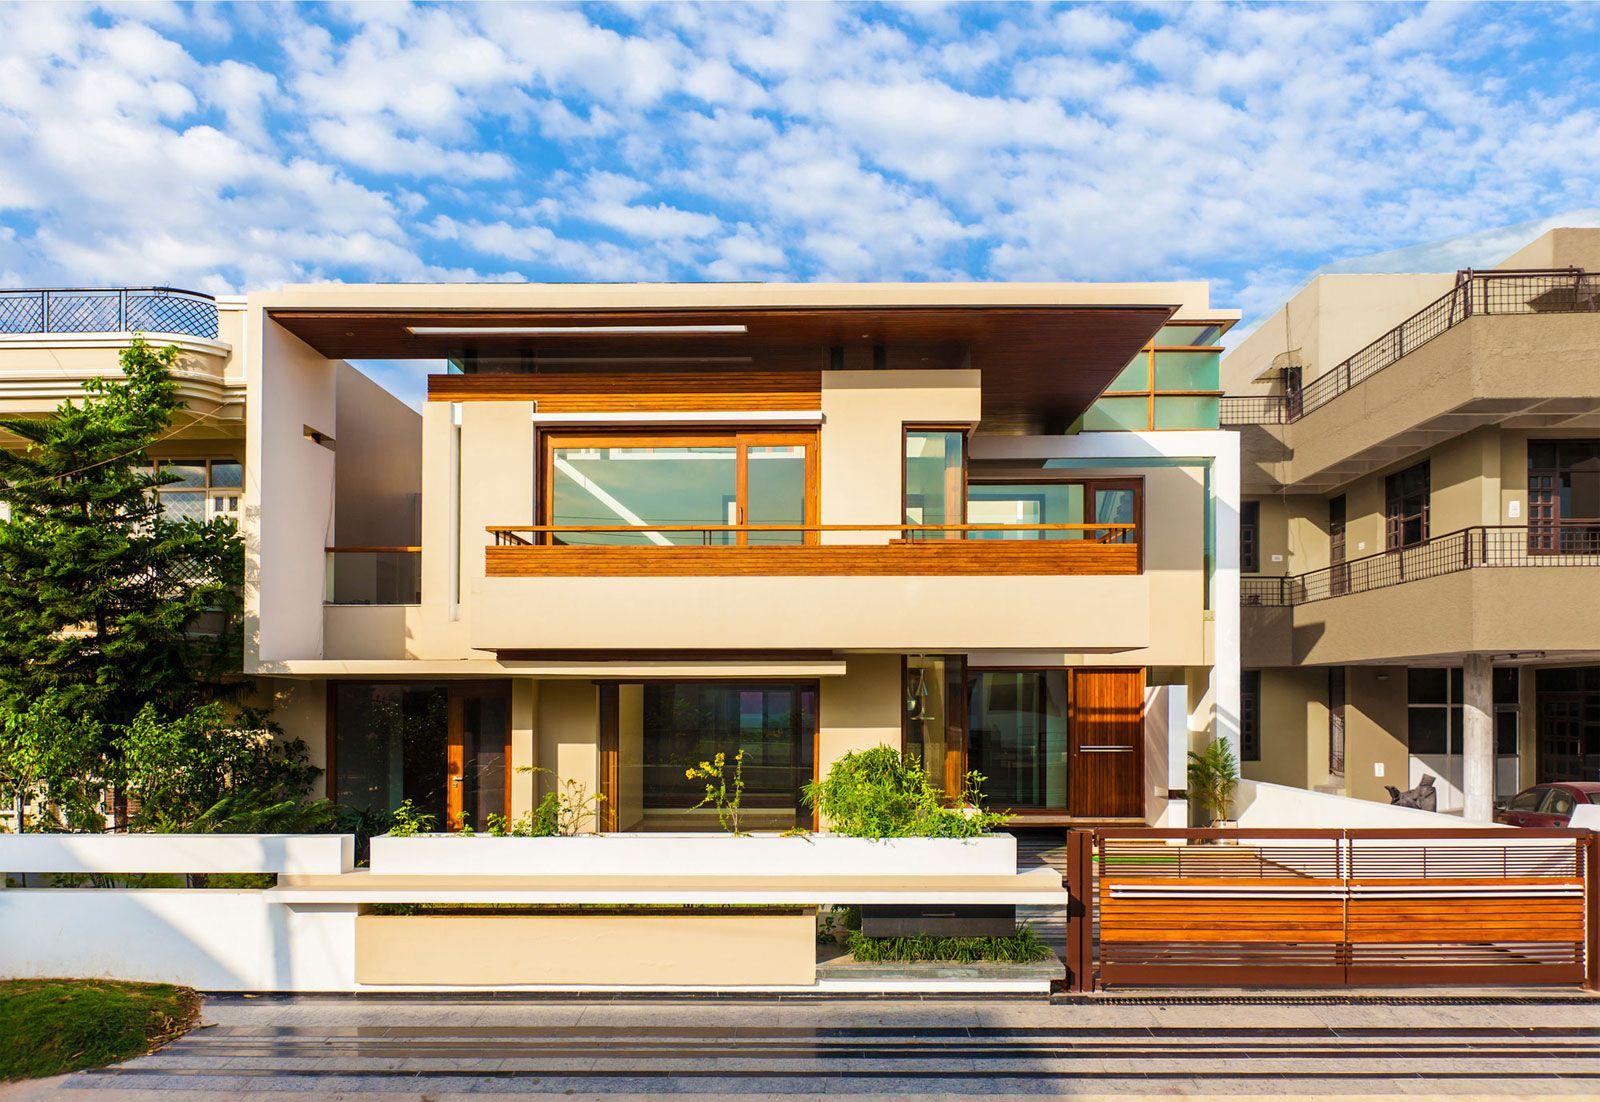 Urban Home Design | Home Design Ideas | bald rock | Pinterest